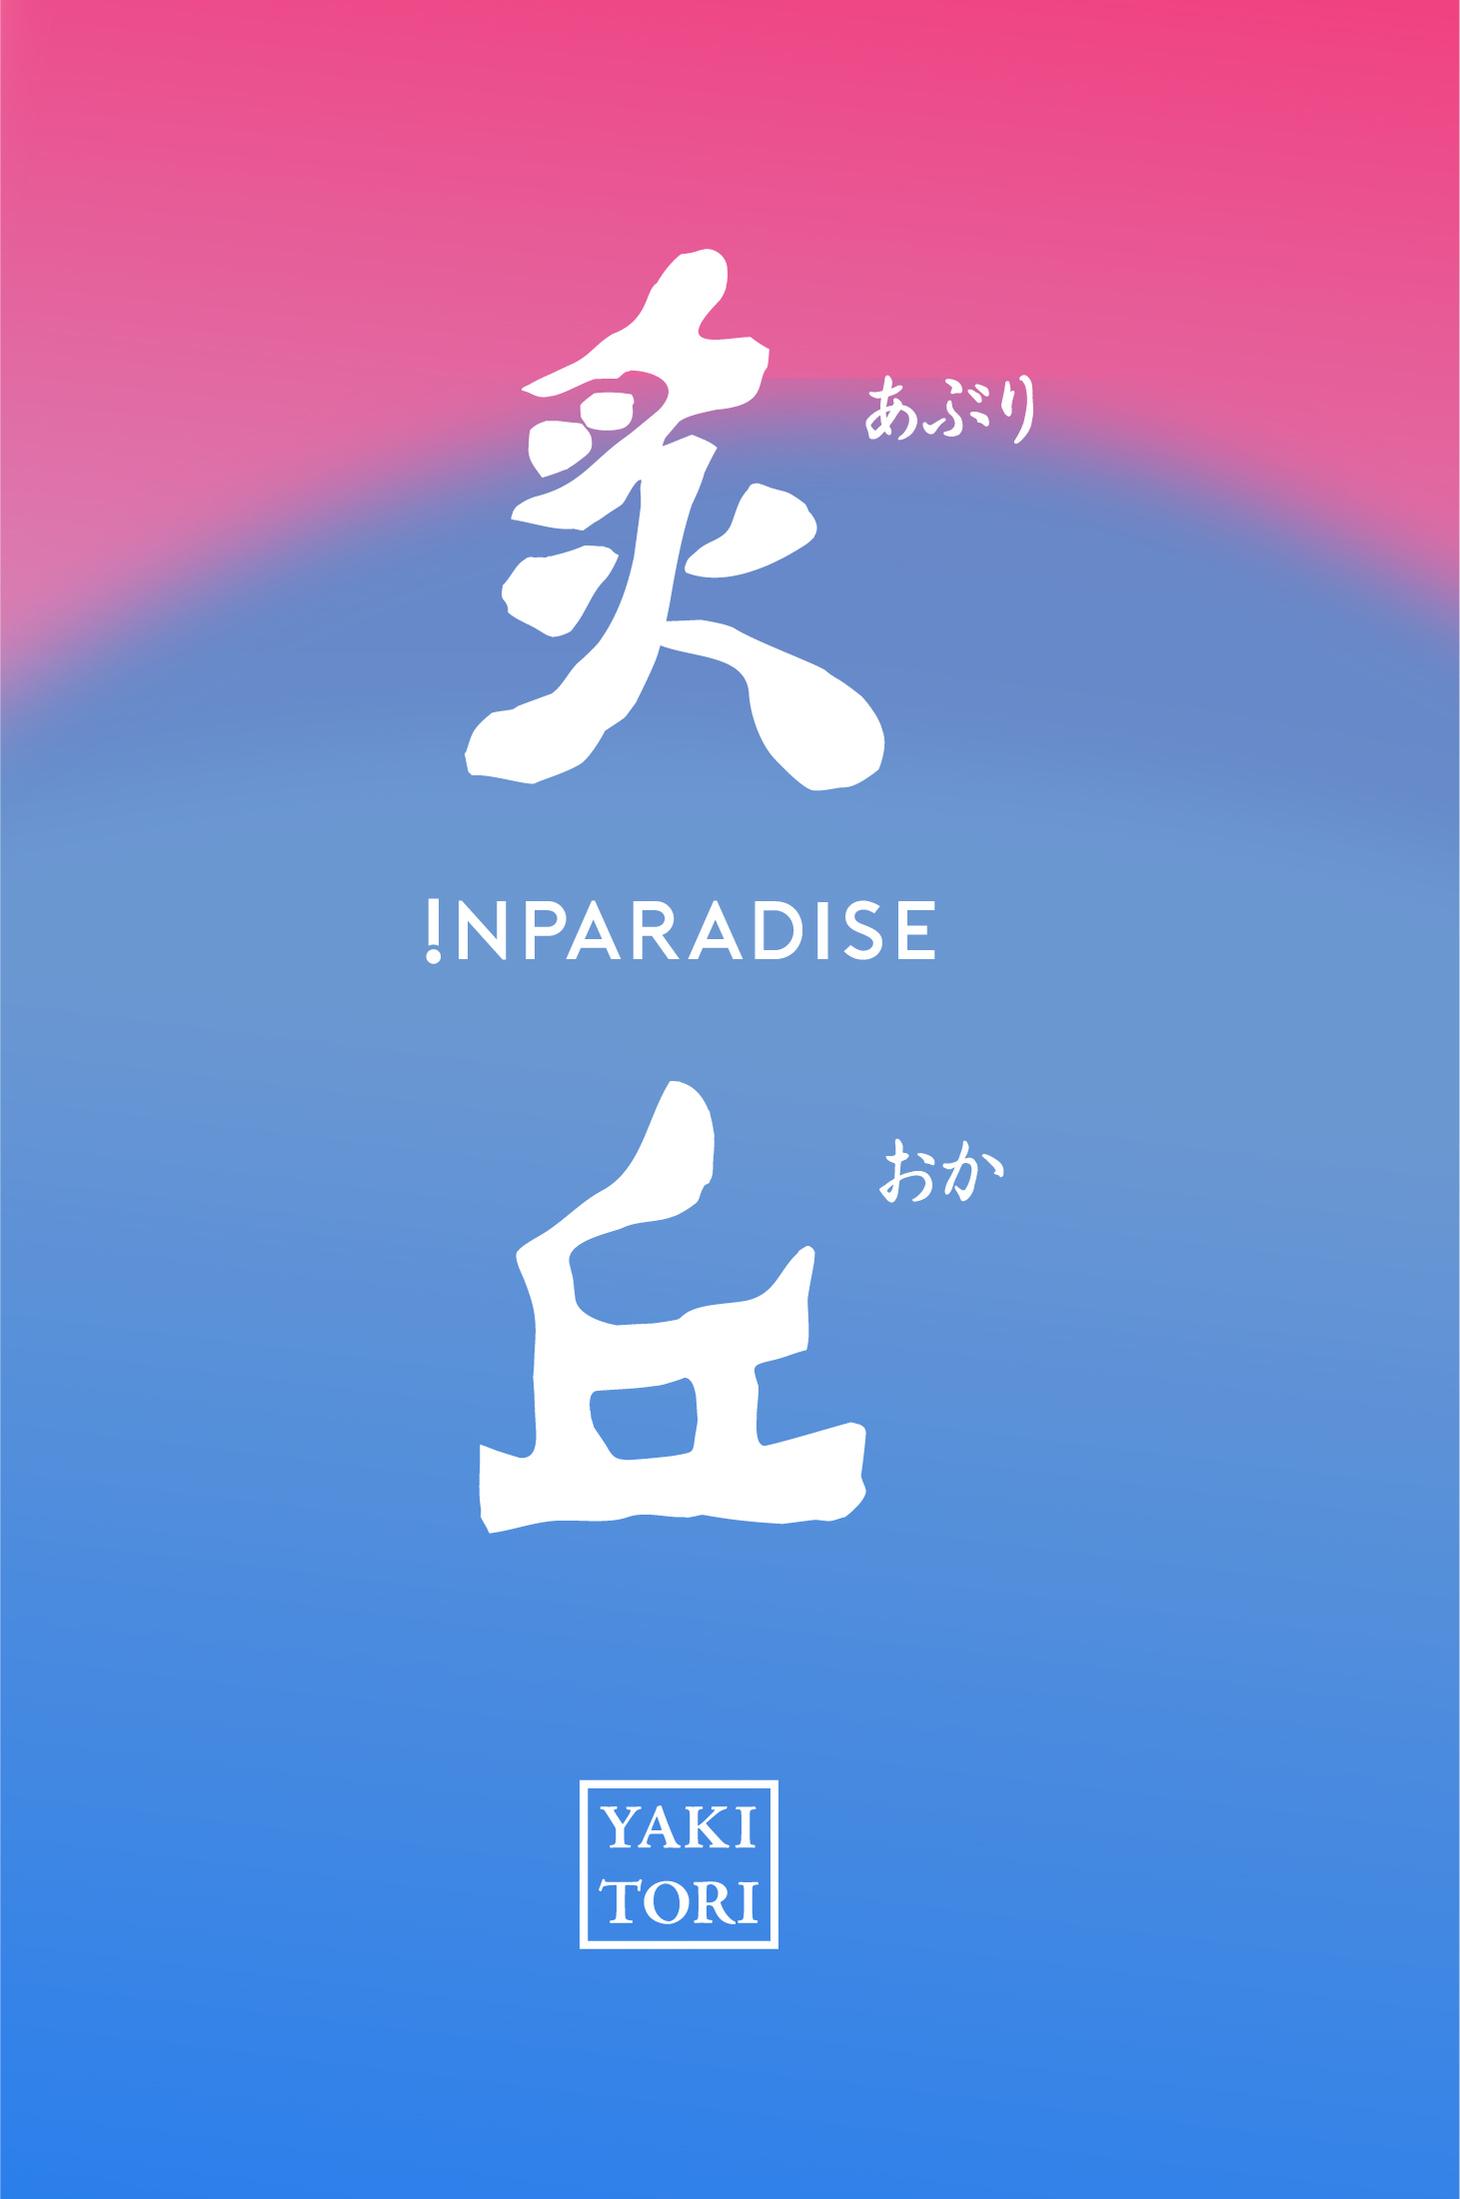 INPARADISE_16.jpg